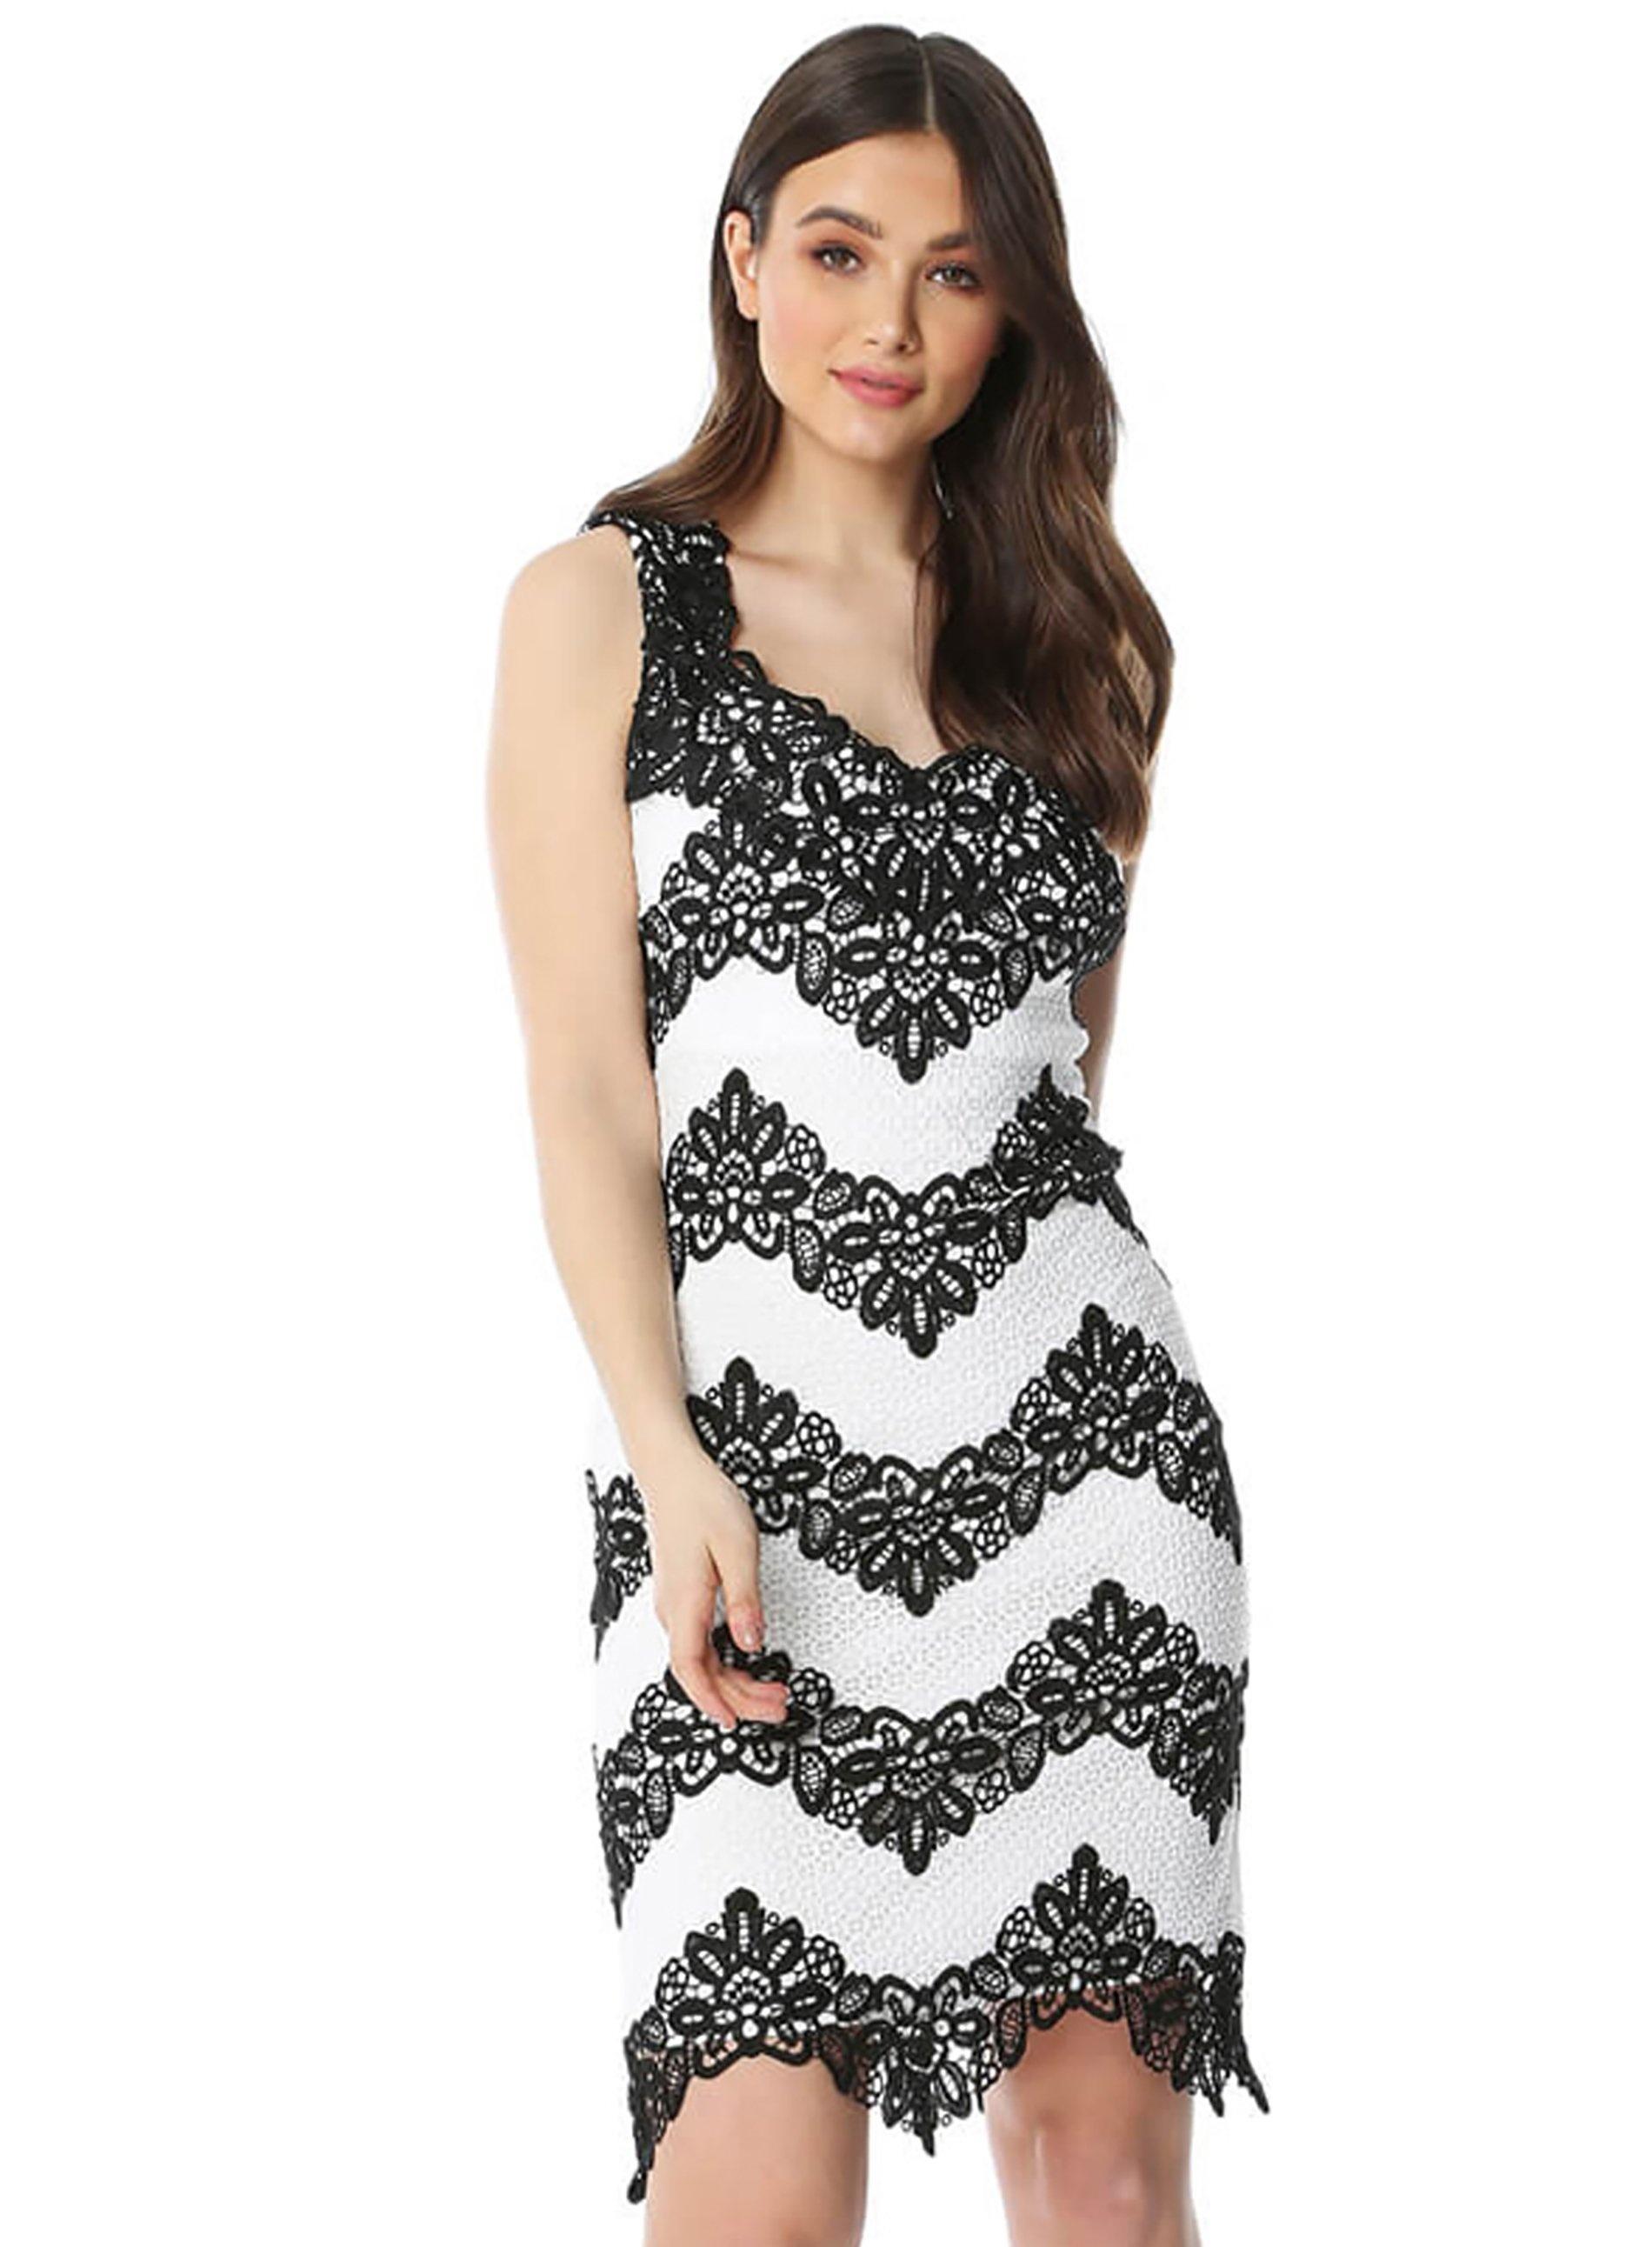 b5c44f3b2e Dorothy Perkins Roman Originals White Zig Zag Lace Dress in White - Lyst